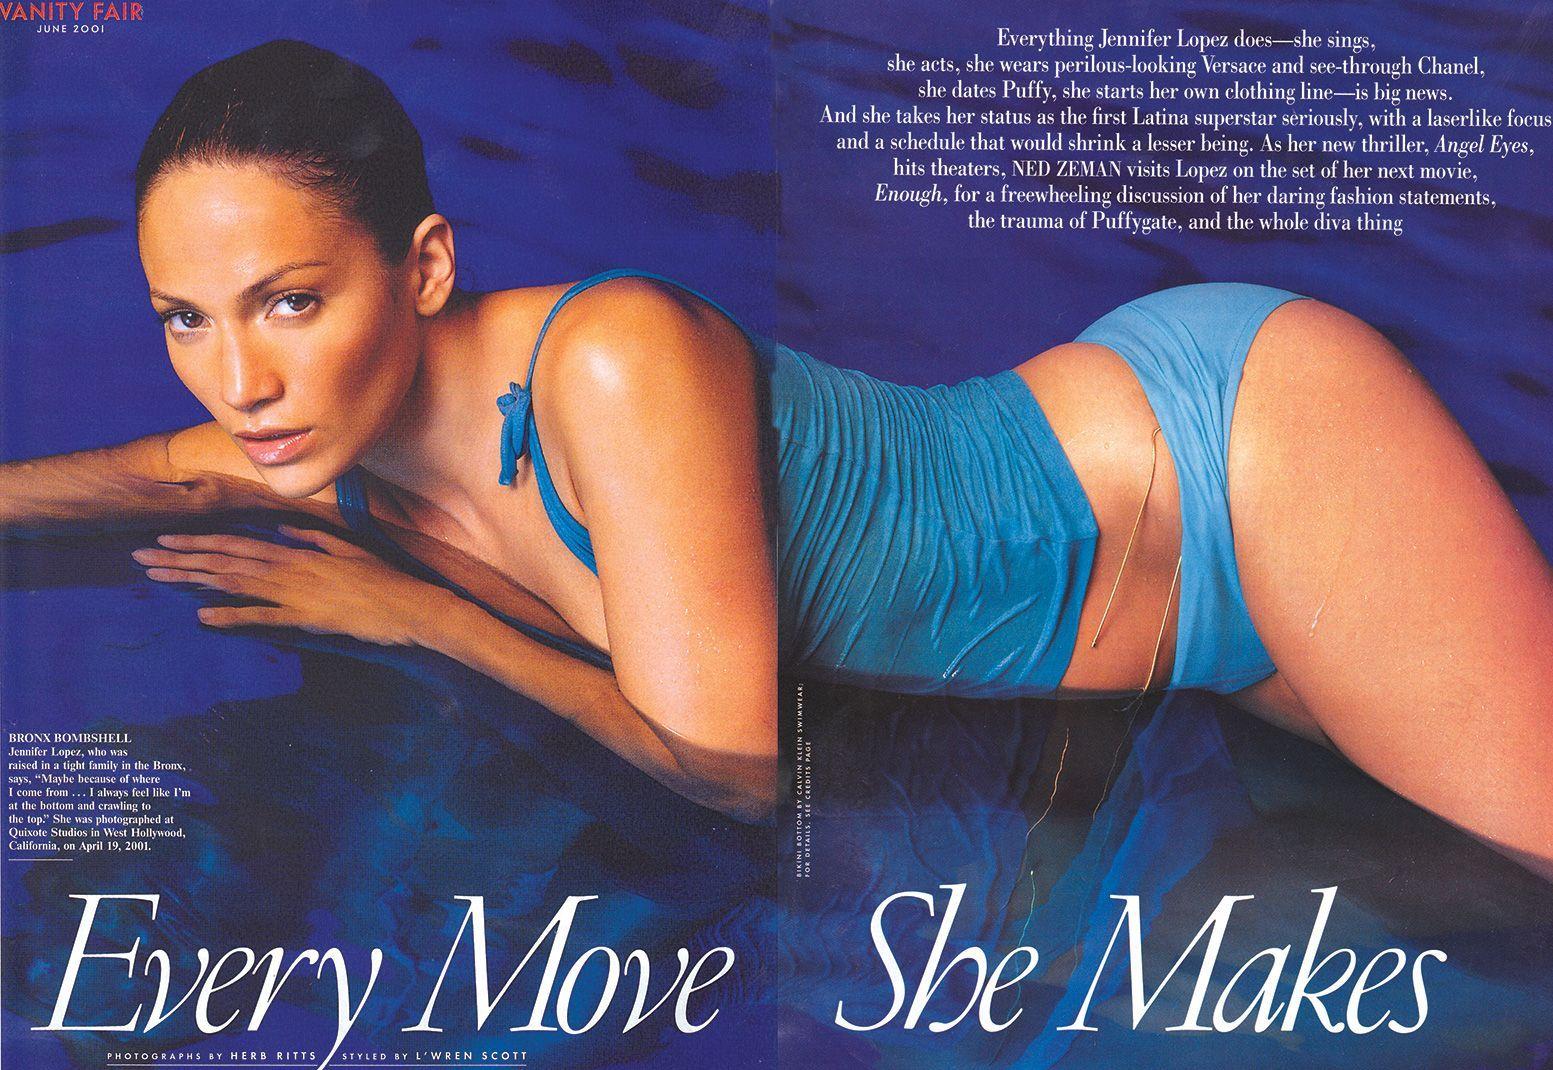 Vanity Fair - Jennifer Lopez 2001